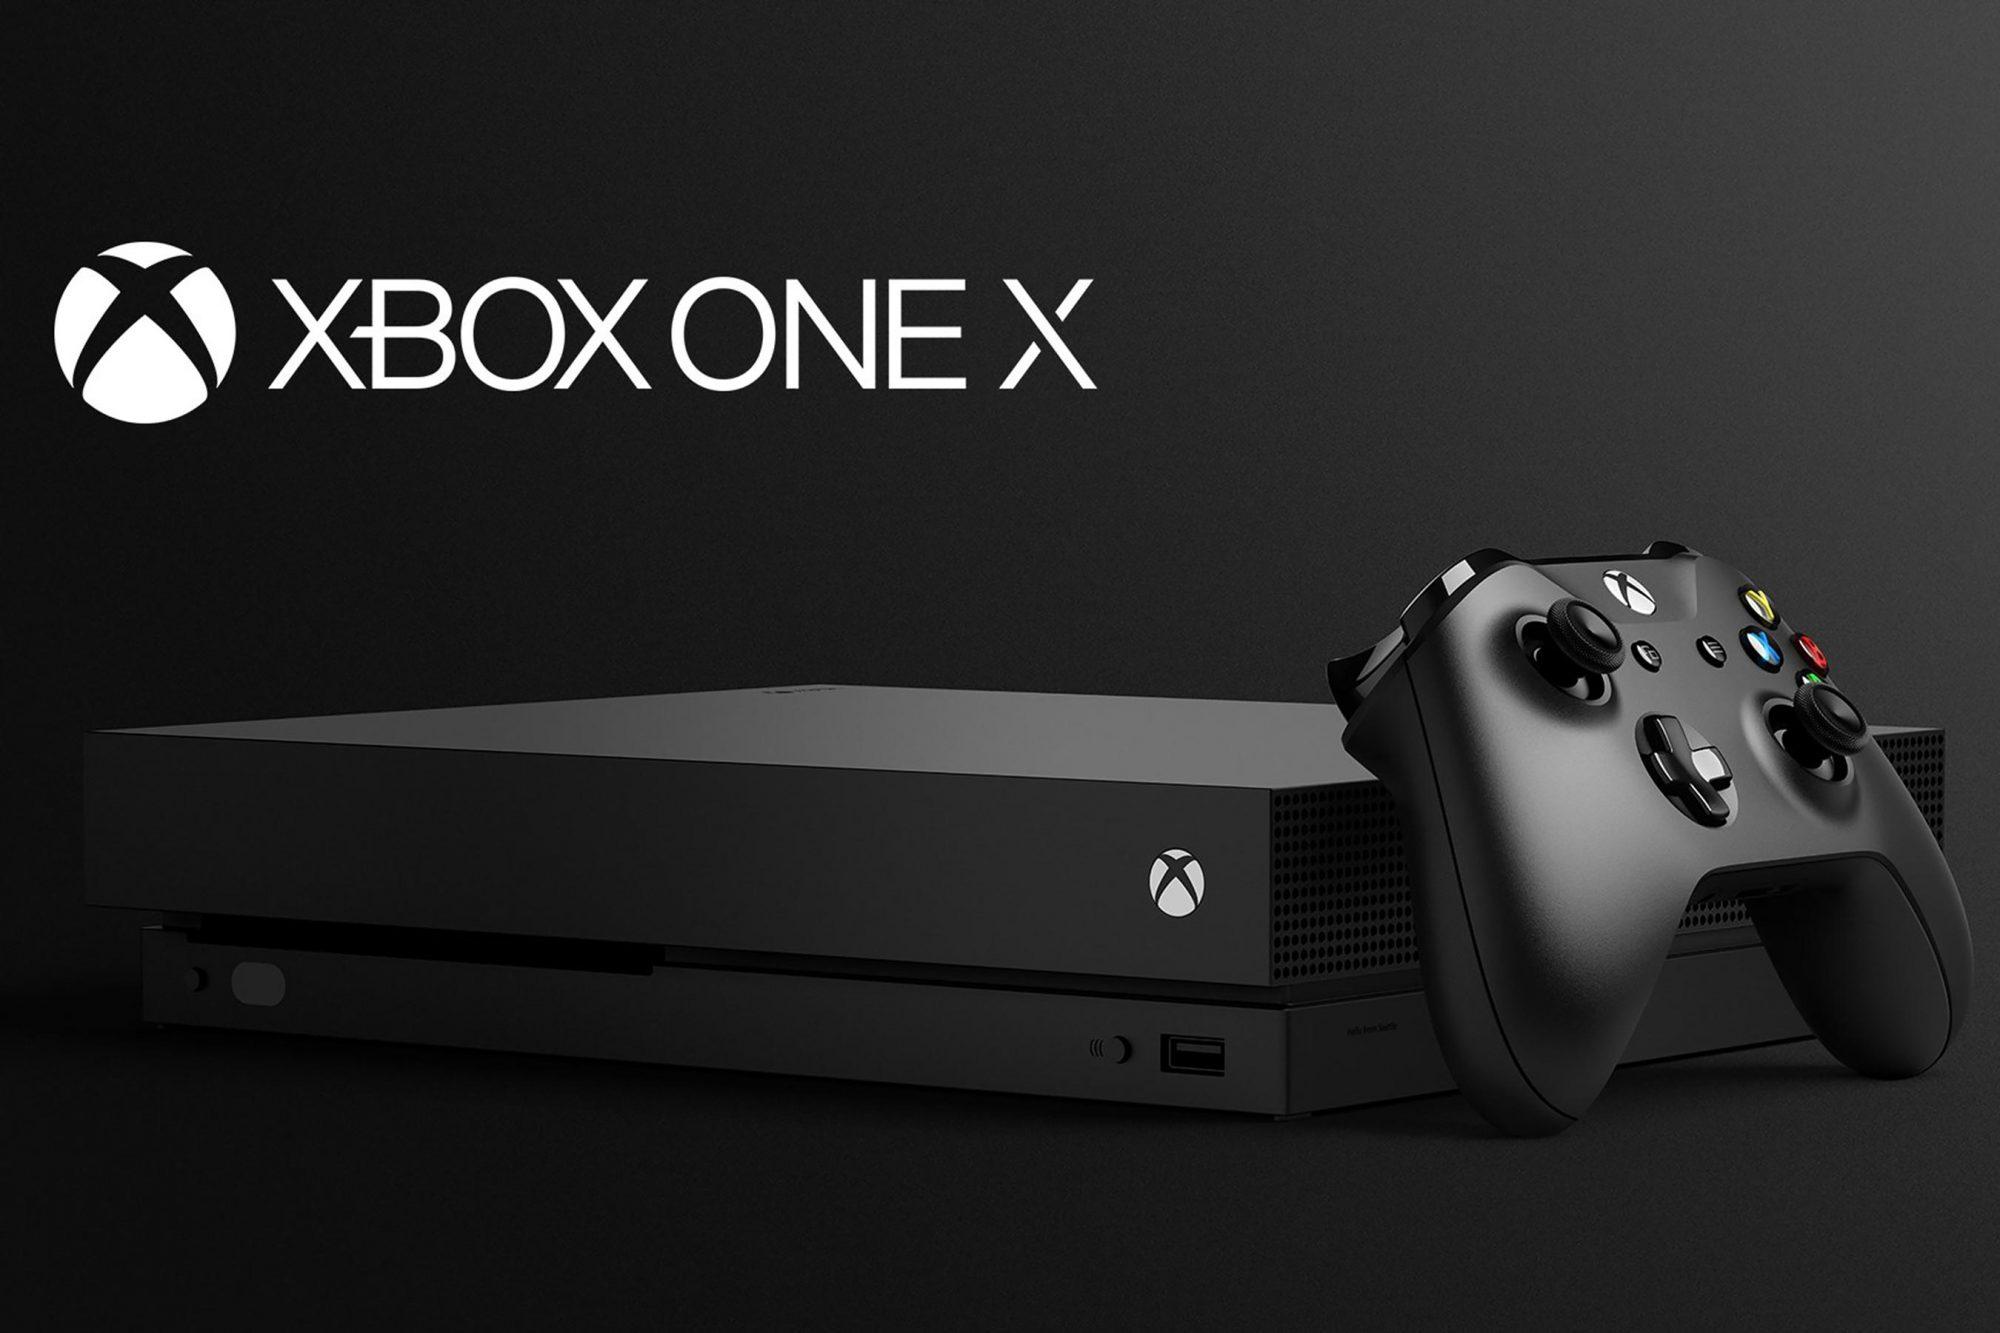 Xbox One X CR: Microsoft